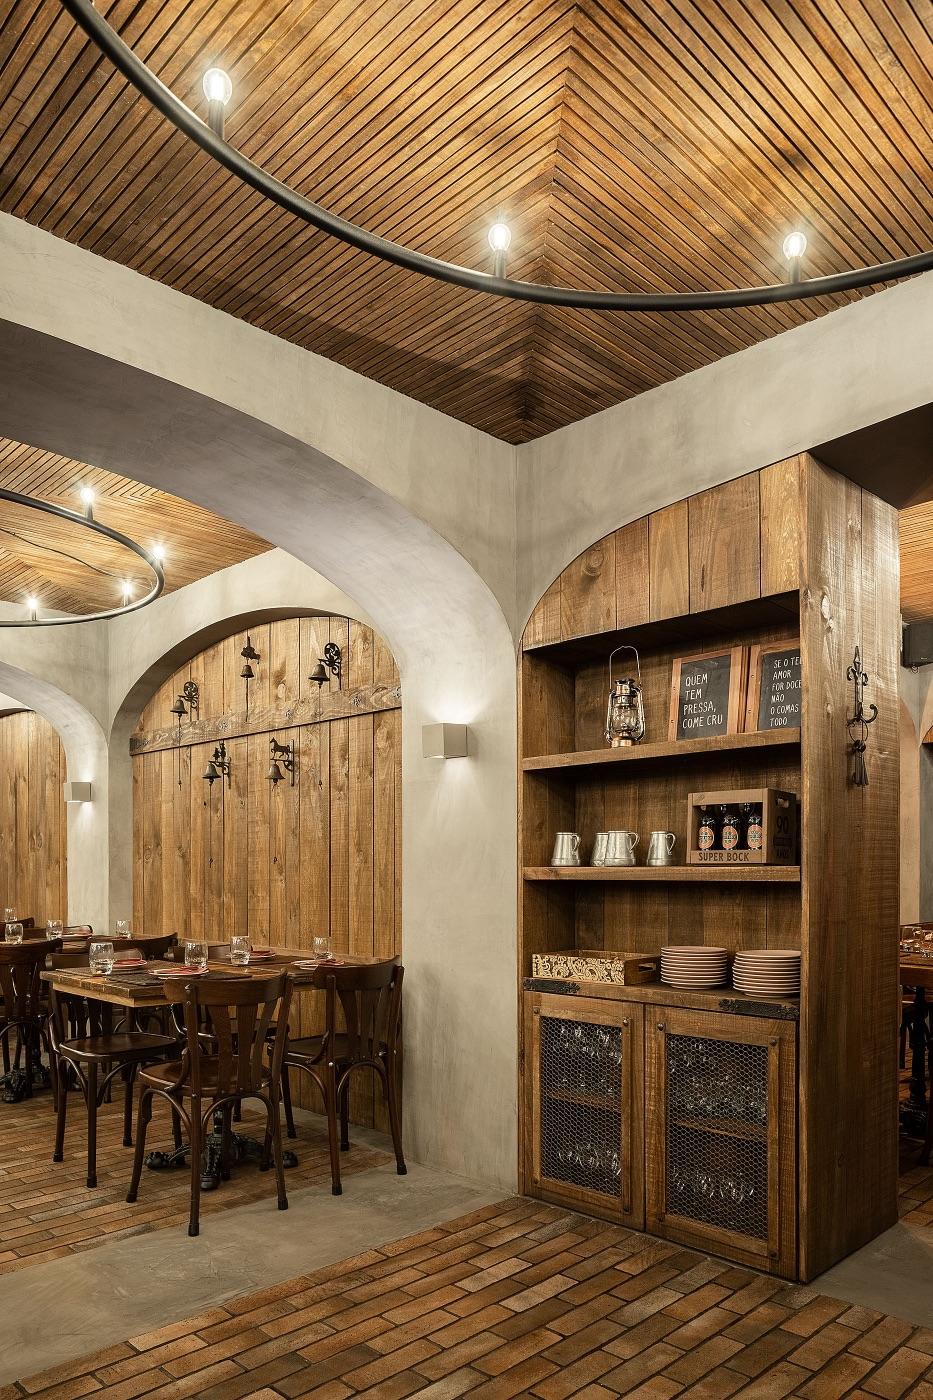 1_BARRIL Restaurant_PAULO MERLINI Architects_Inspirationist